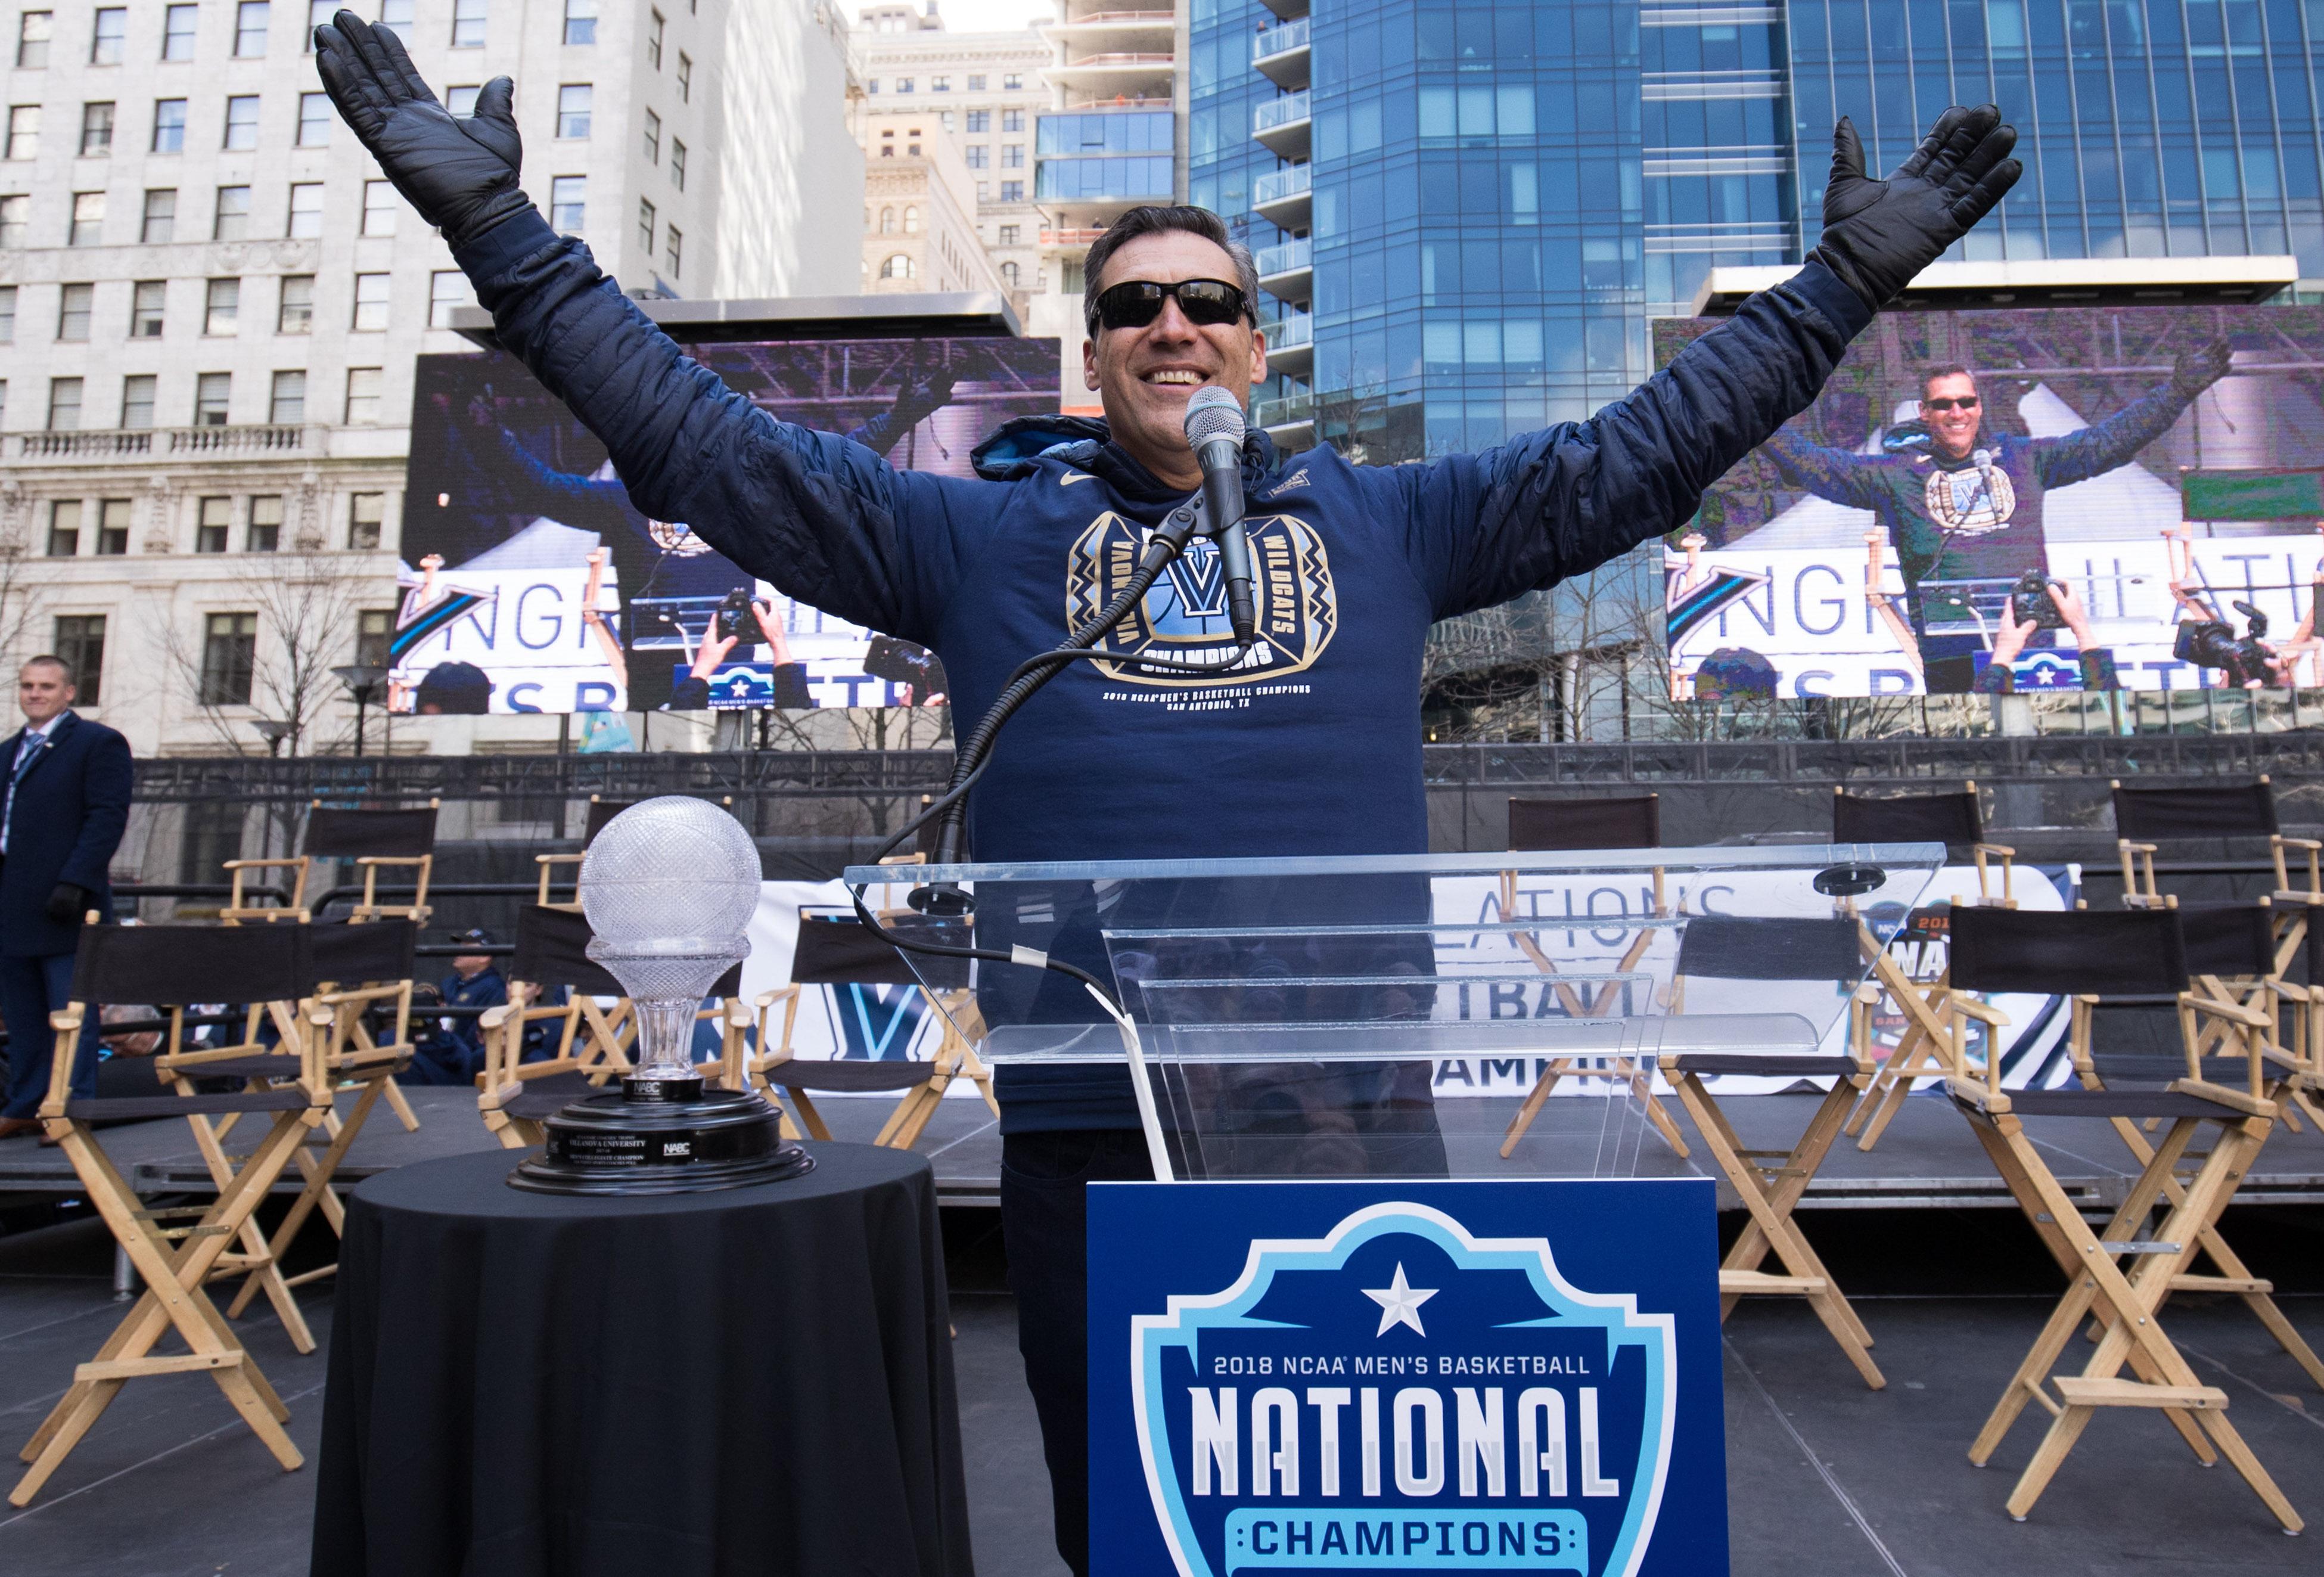 NCAA Basketball: Final Four National Champions-Villanova Parade